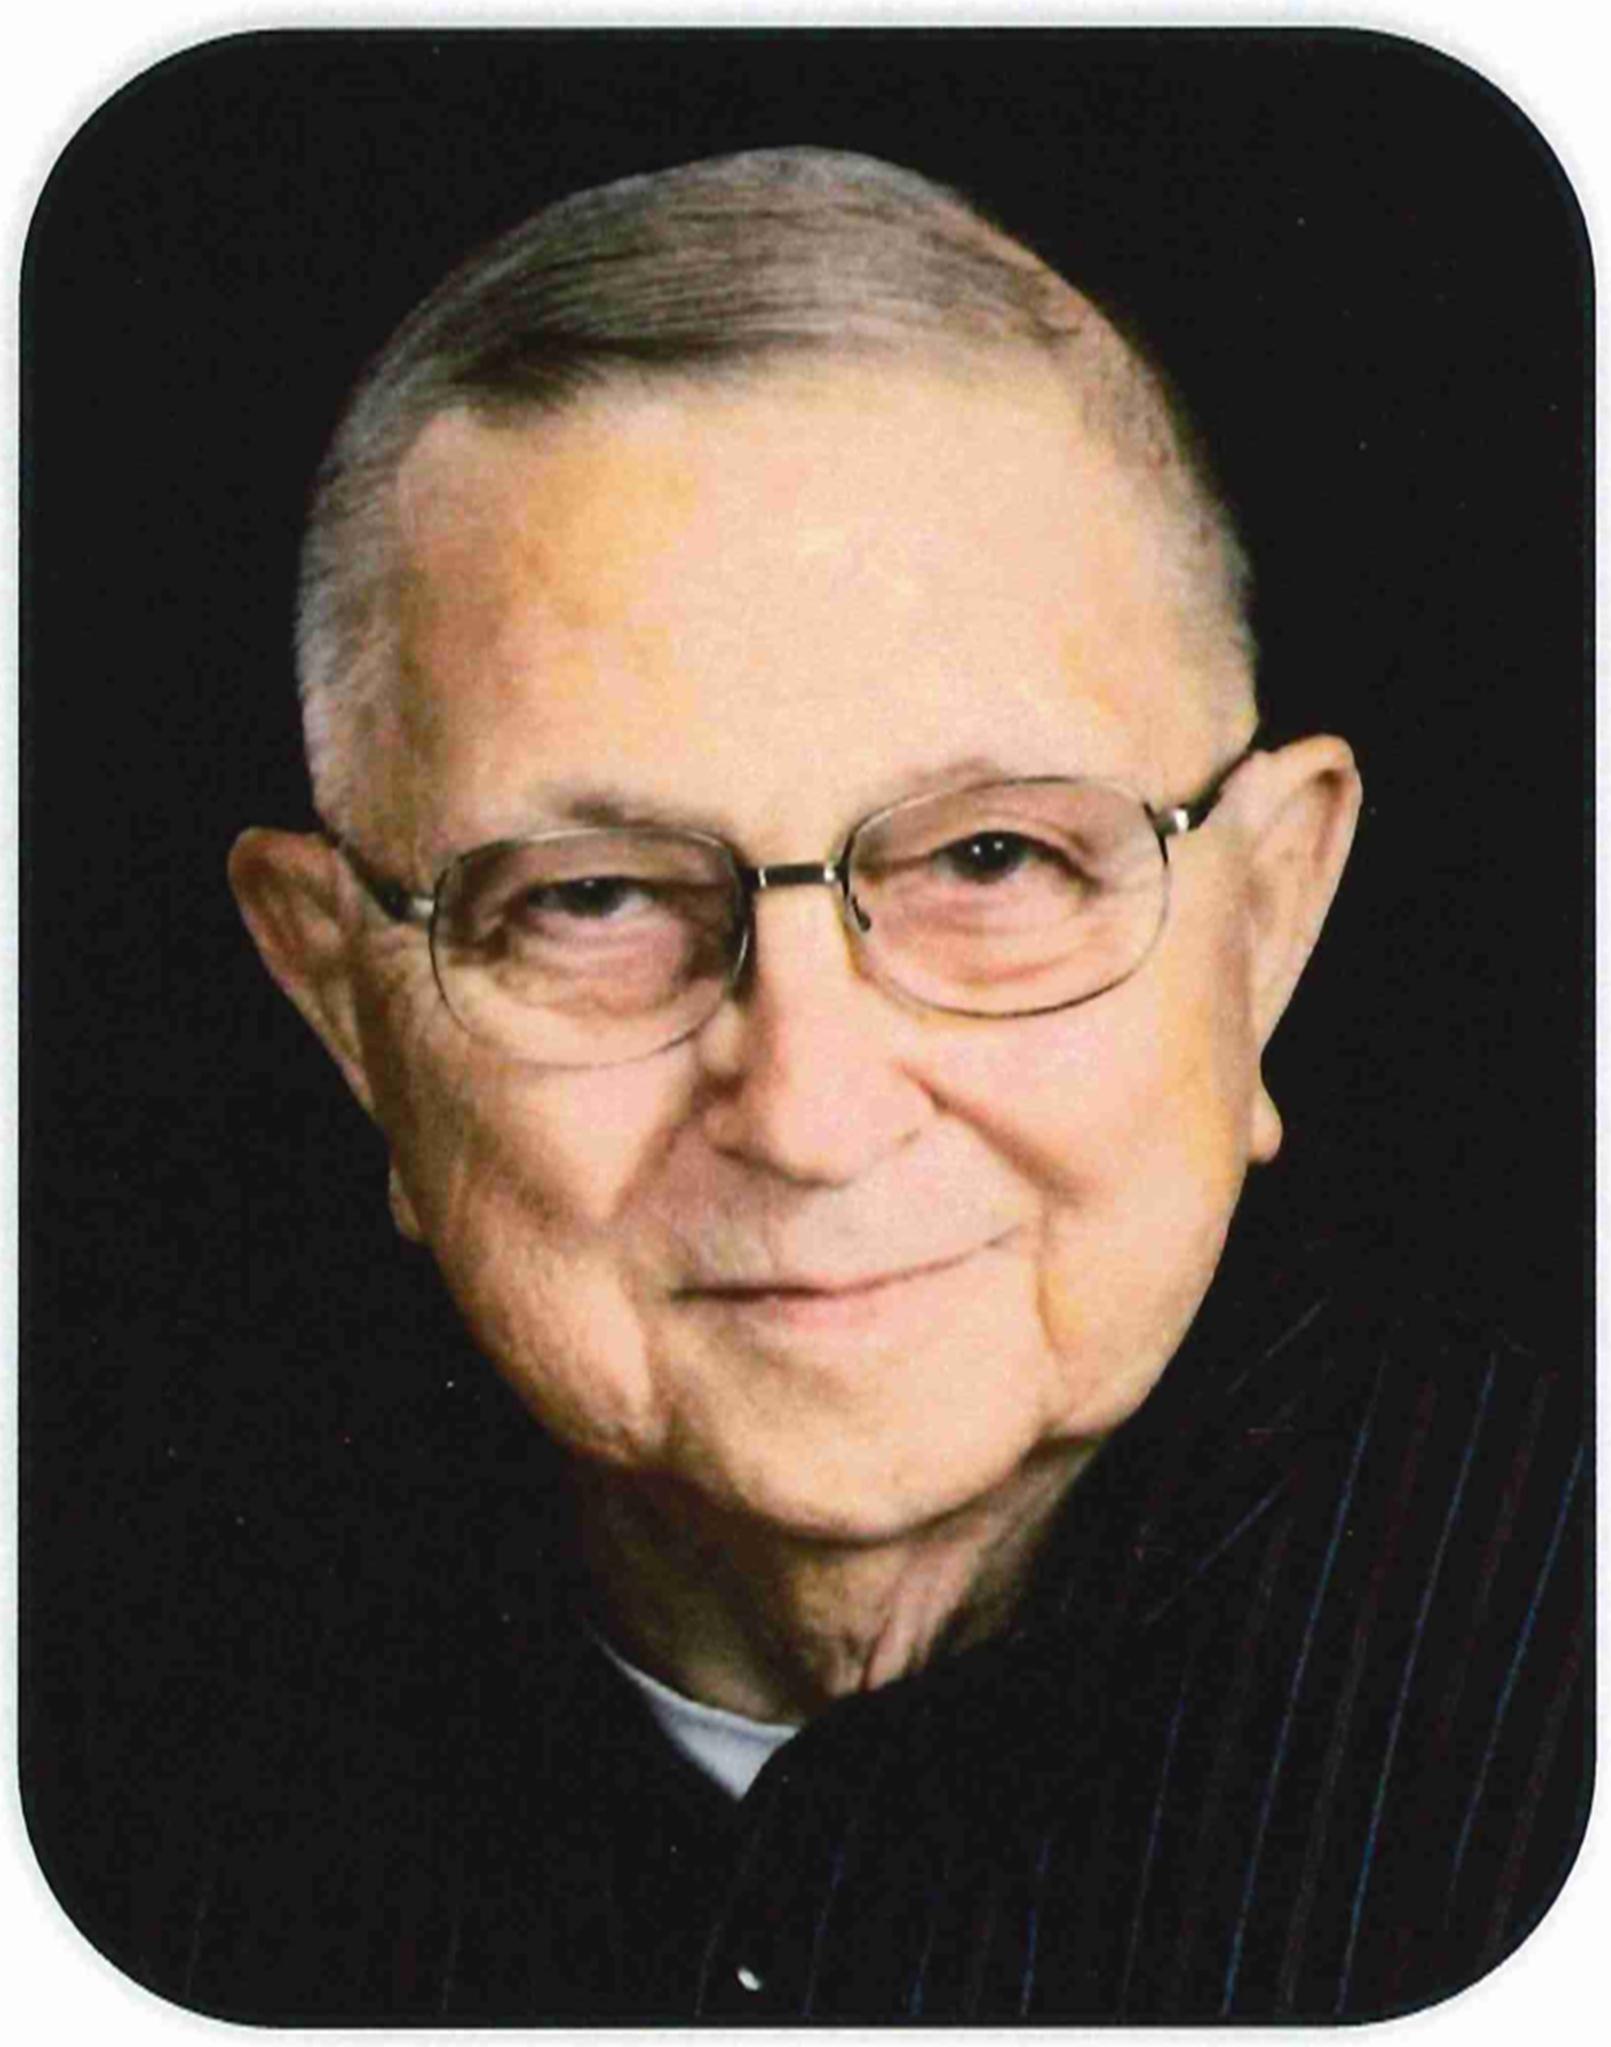 Roger Joseph Herdina